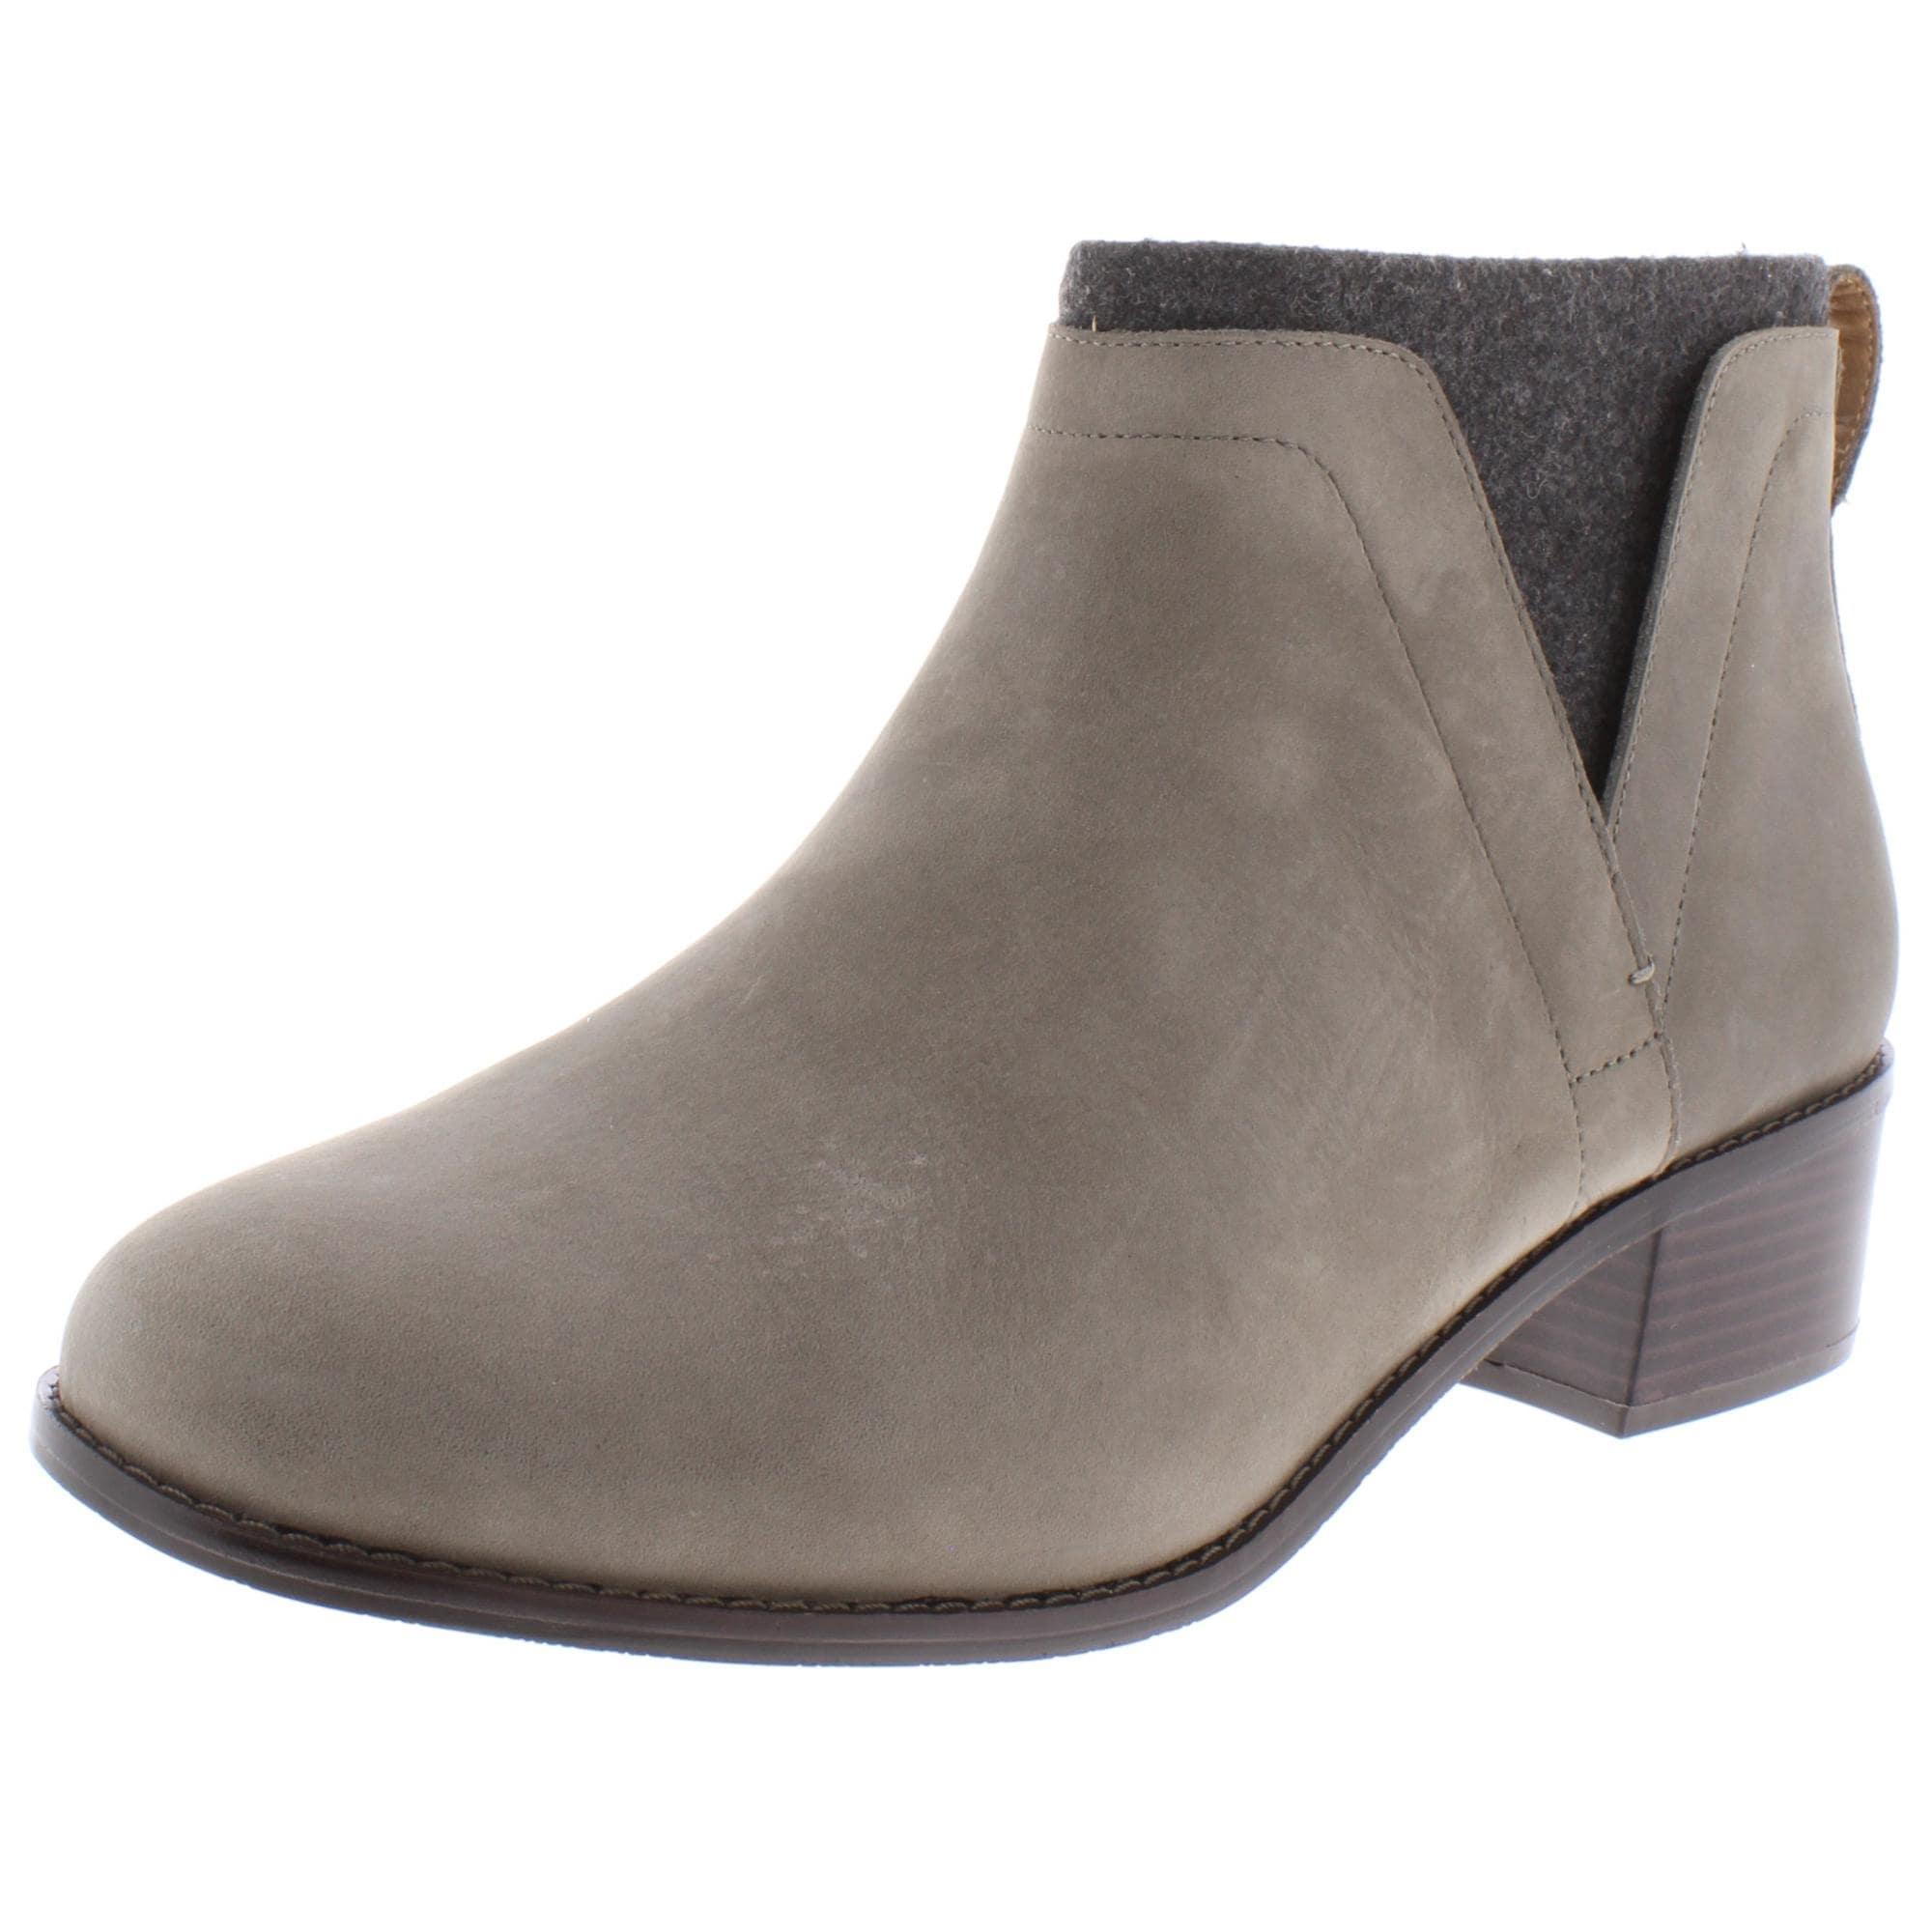 Vionic Womens Hope Joslyn Ankle Boots